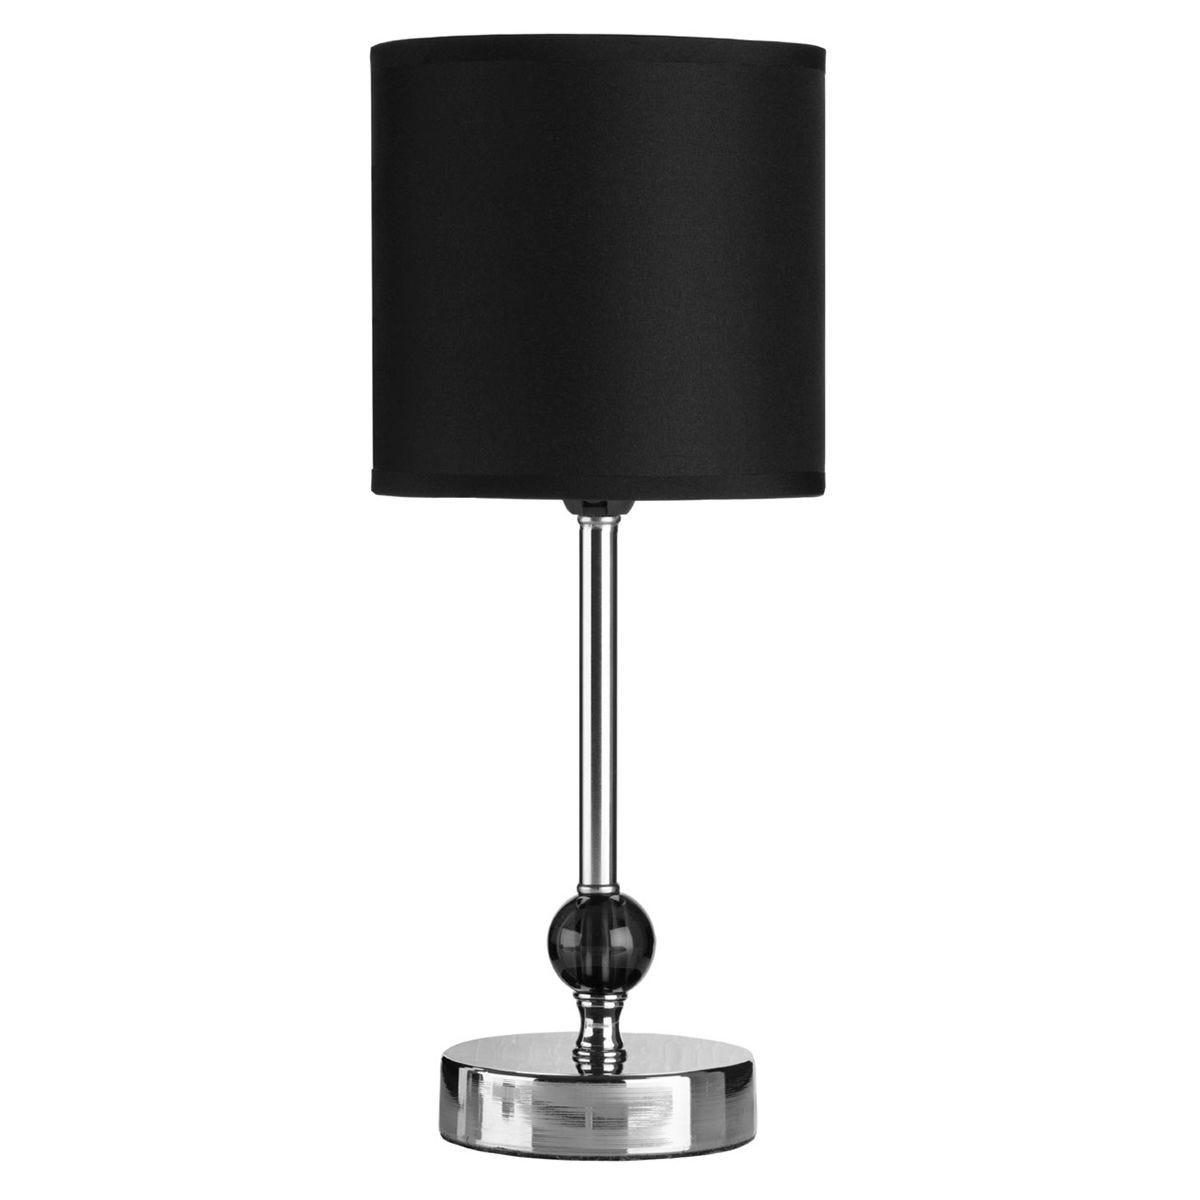 Premier Housewares Chrome Table Lamp with Black Acrylic Ball & Black Shade